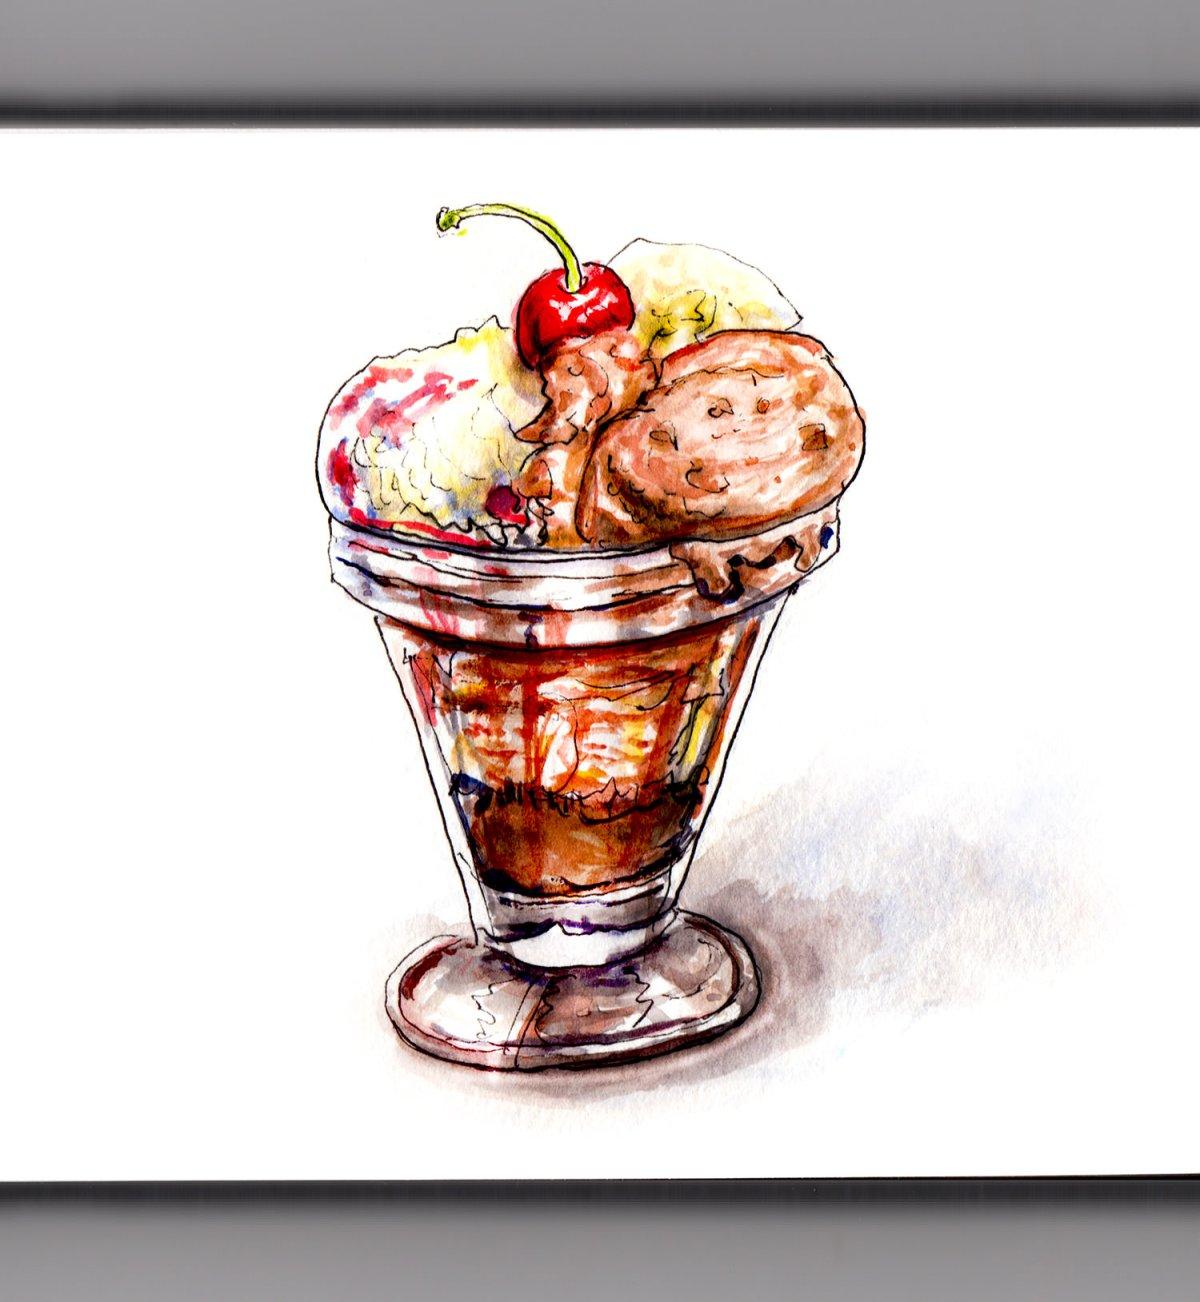 Day 30 - #WorldWatercolorGroup - Ice Cream Sundae Dessert With Cherry - #doodlewash